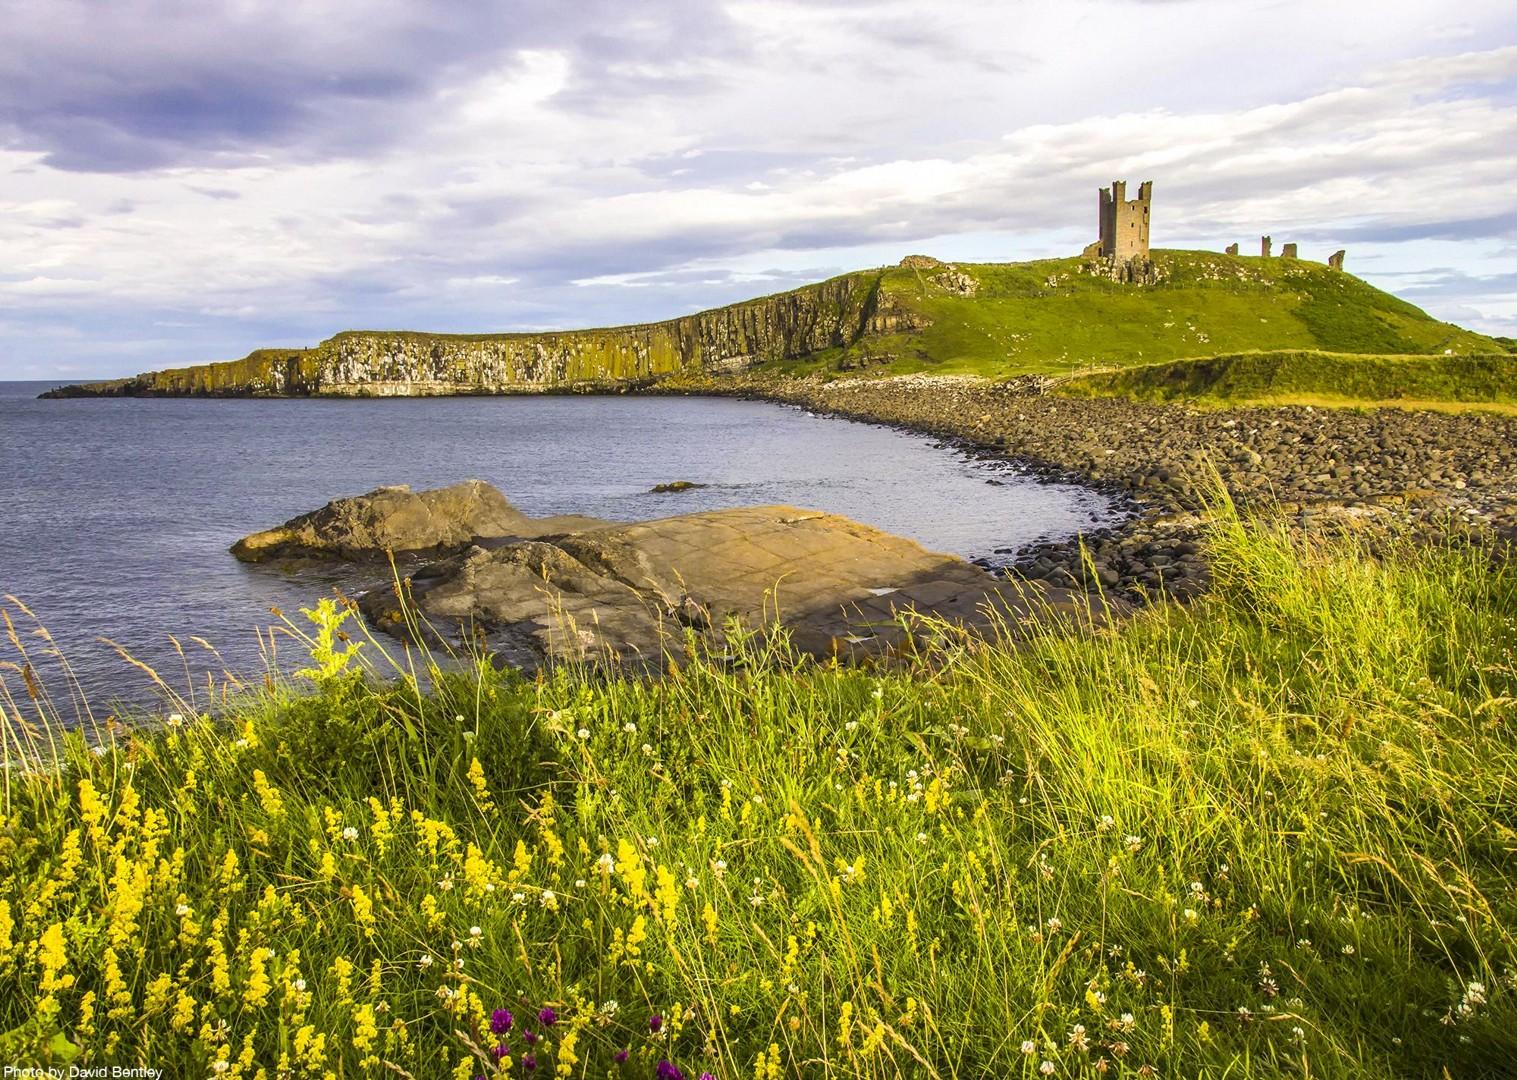 castles-self-guided-2-day-northumberland-coast-holiday-cycling-tour.jpg - UK - Northumberland - Alnmouth - Self-Guided Leisure Cycling Holiday - Leisure Cycling